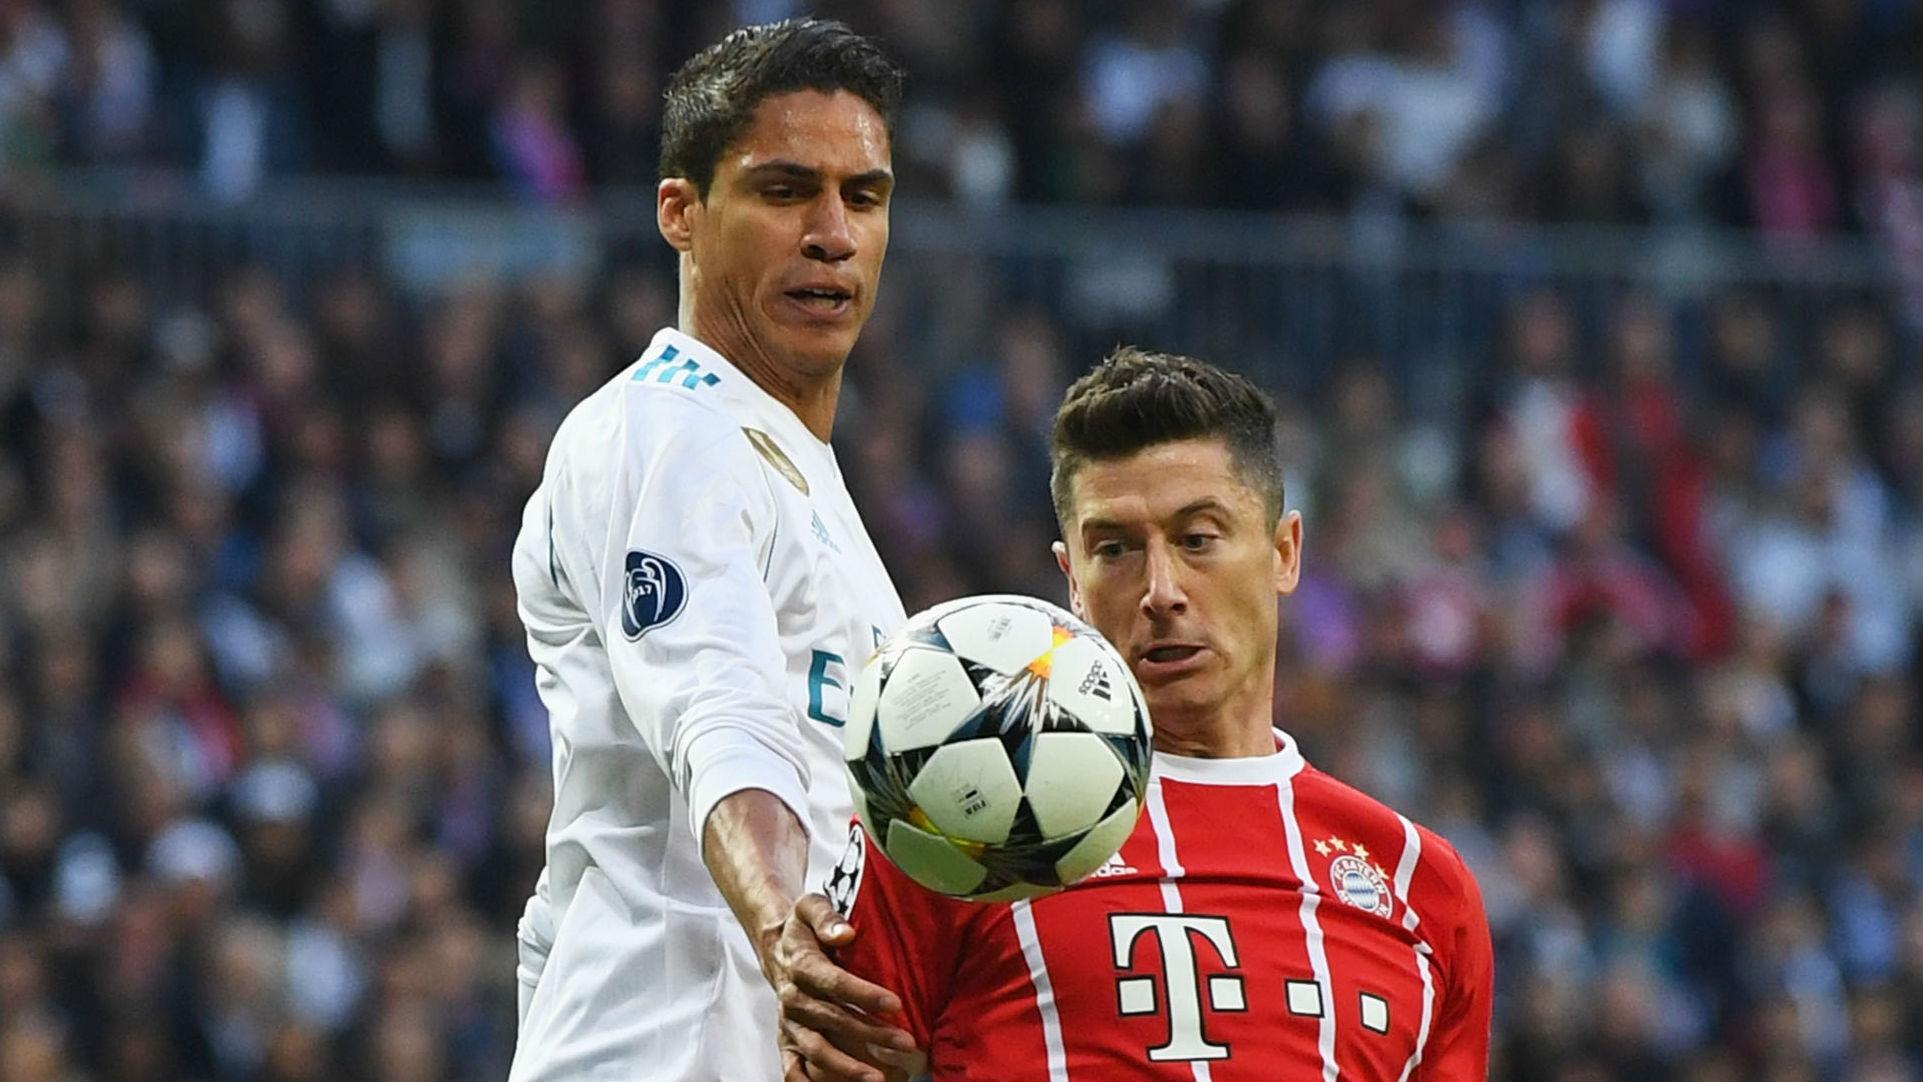 Real Madrid jugará su tercera final de Champions consecutiva